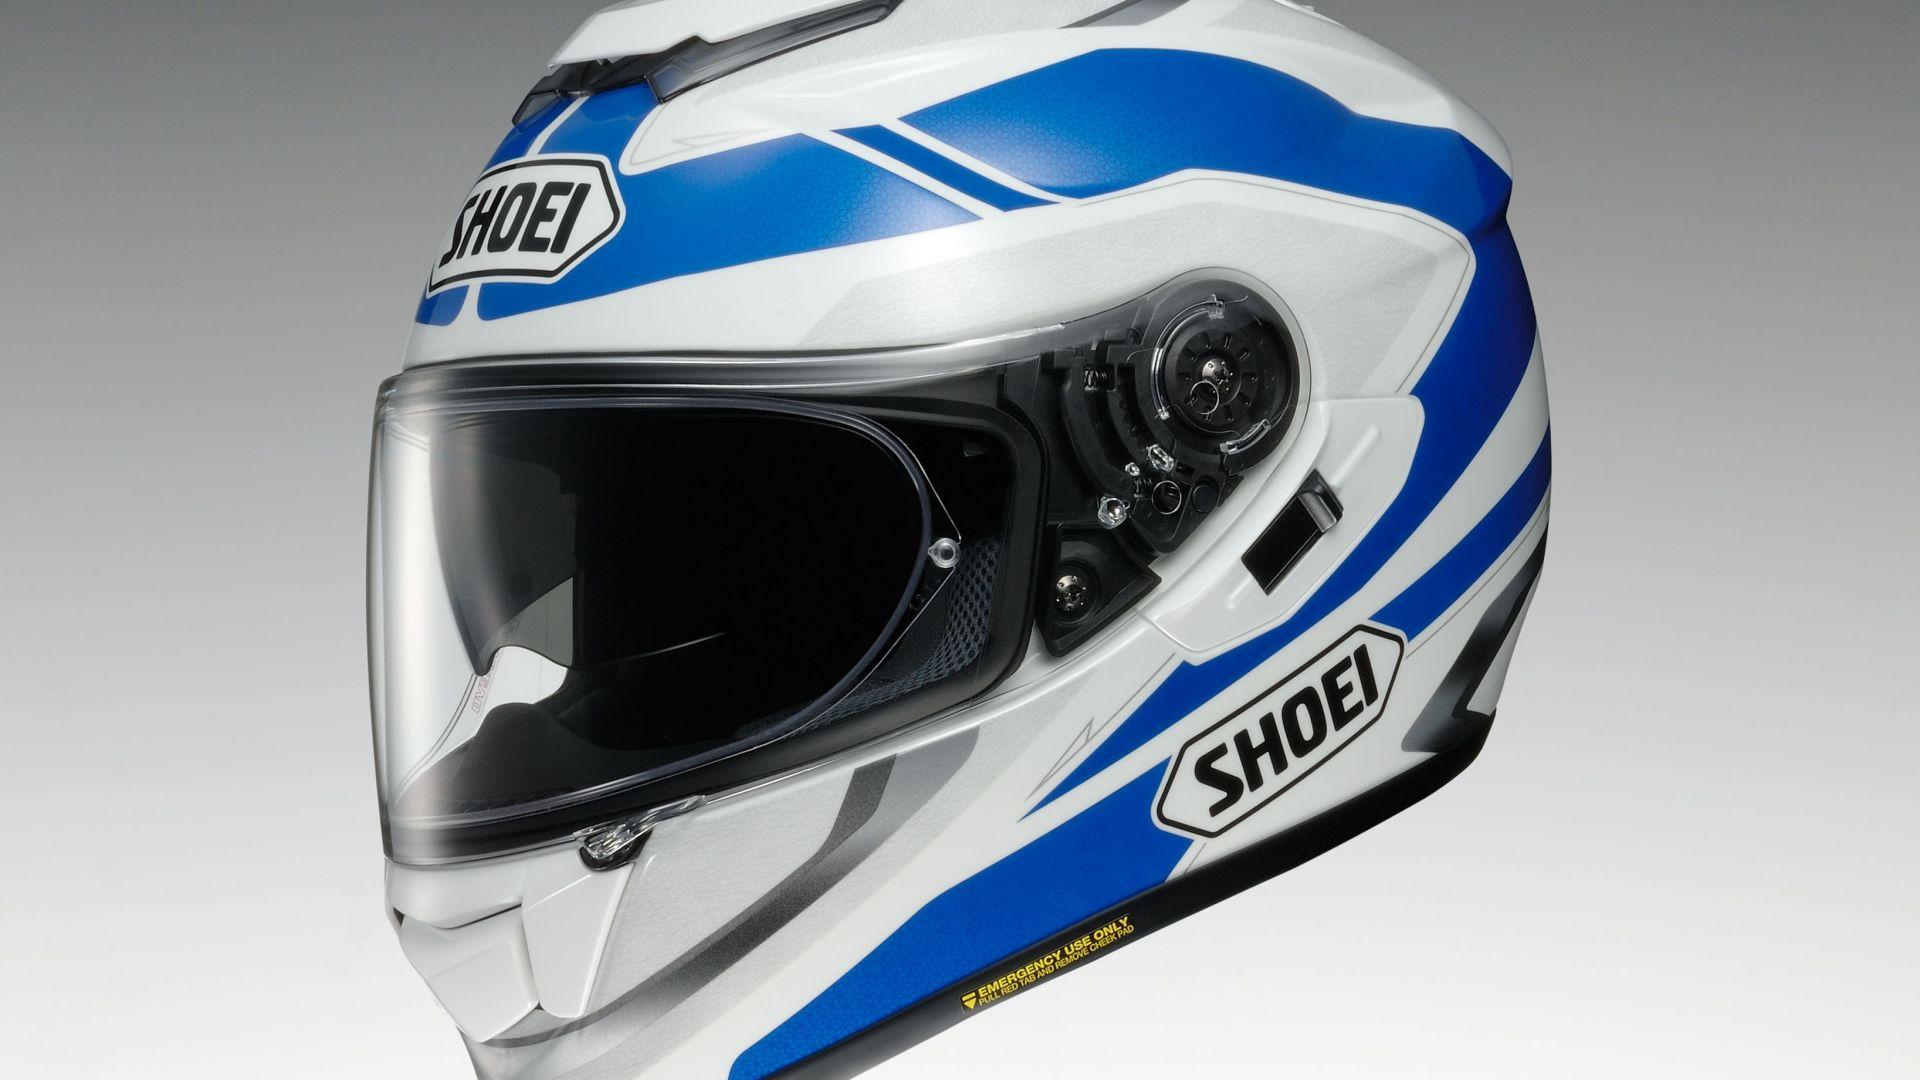 Shoei Gt Air >> Caschi: Shoei: il GT-Air si rinnova per il 2017 - MotorBox